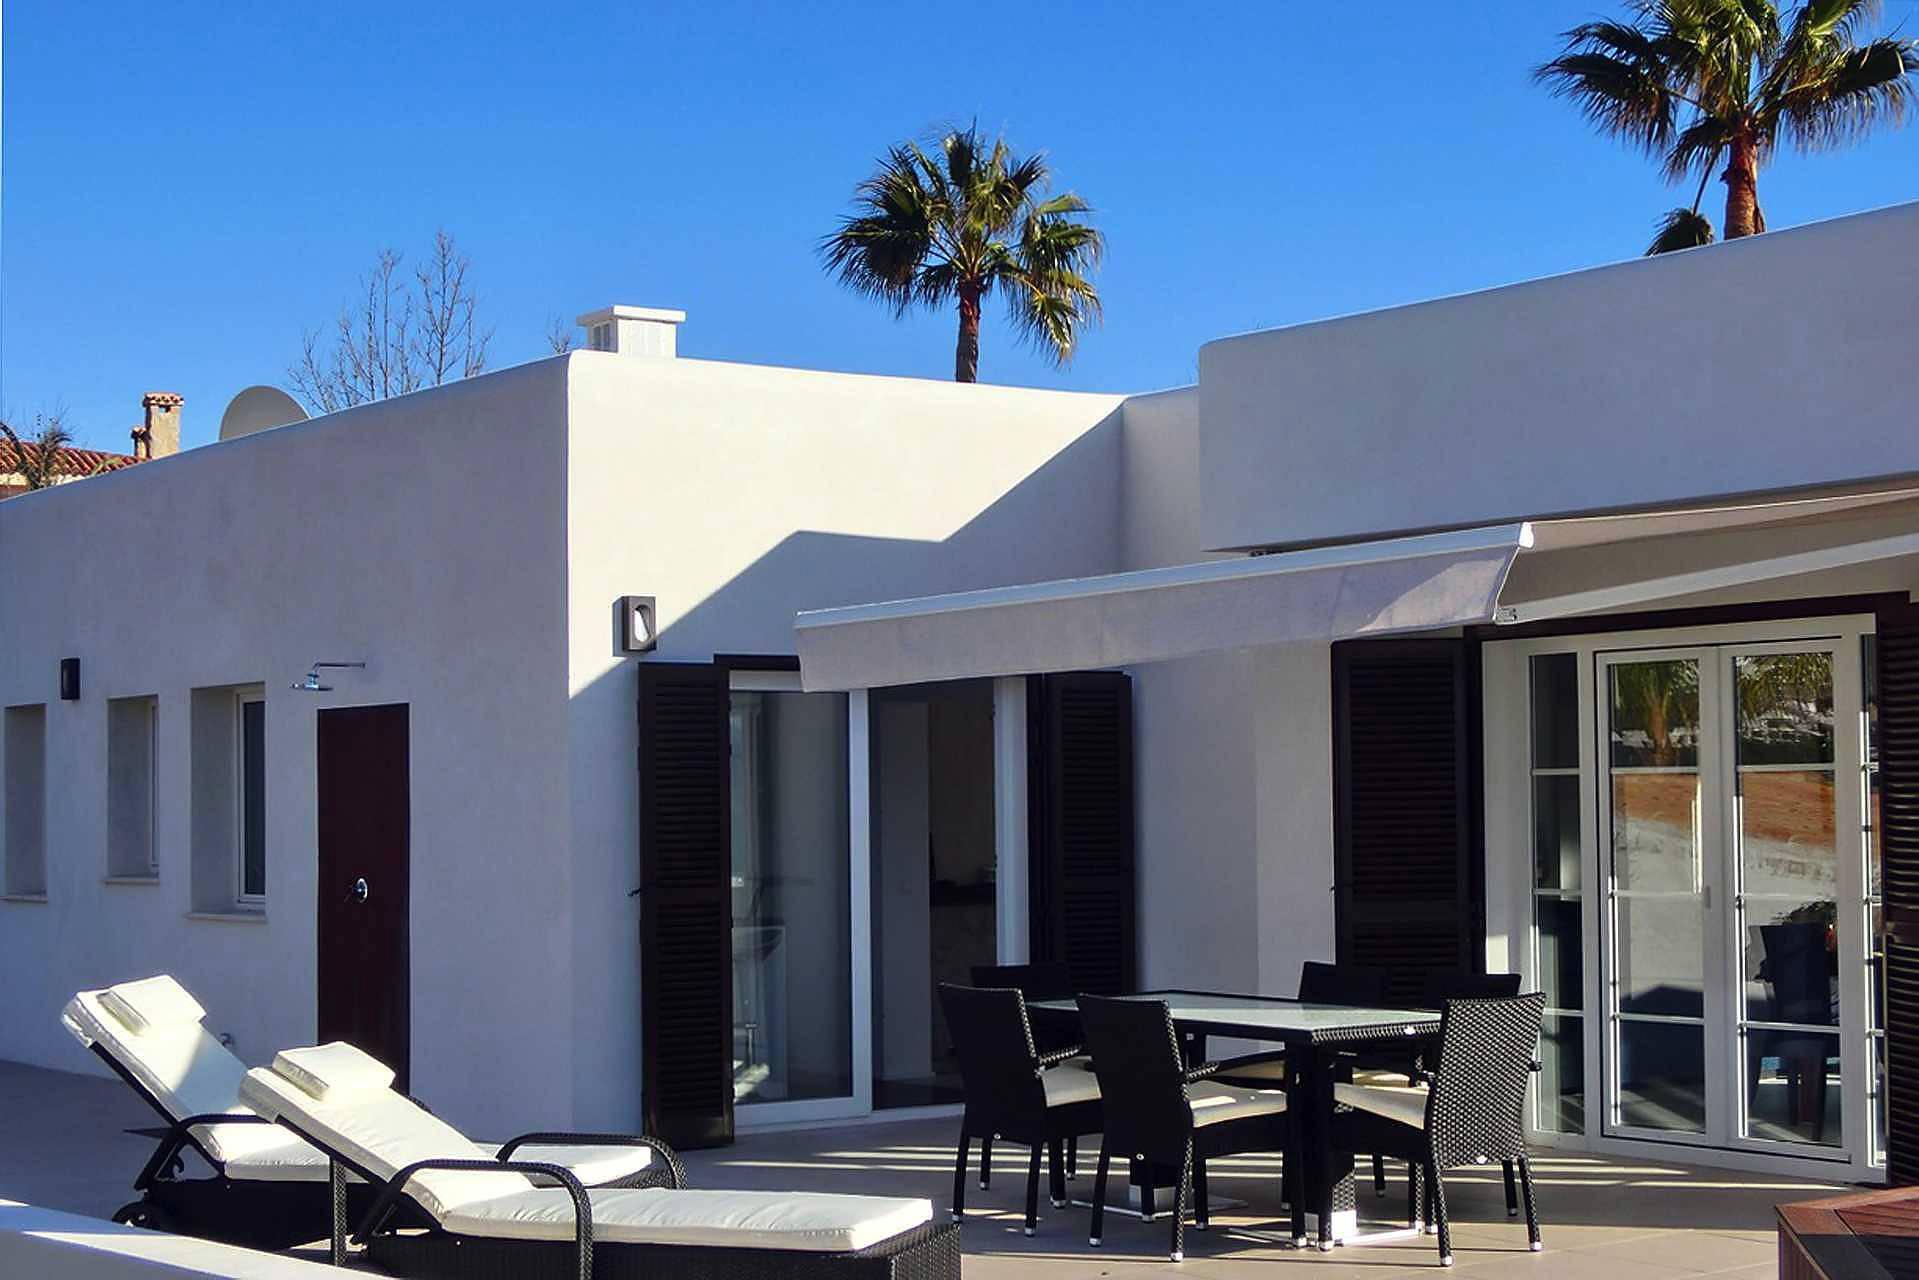 01-95 Ferienhaus Mallorca Süden mit Meerblick Bild 6